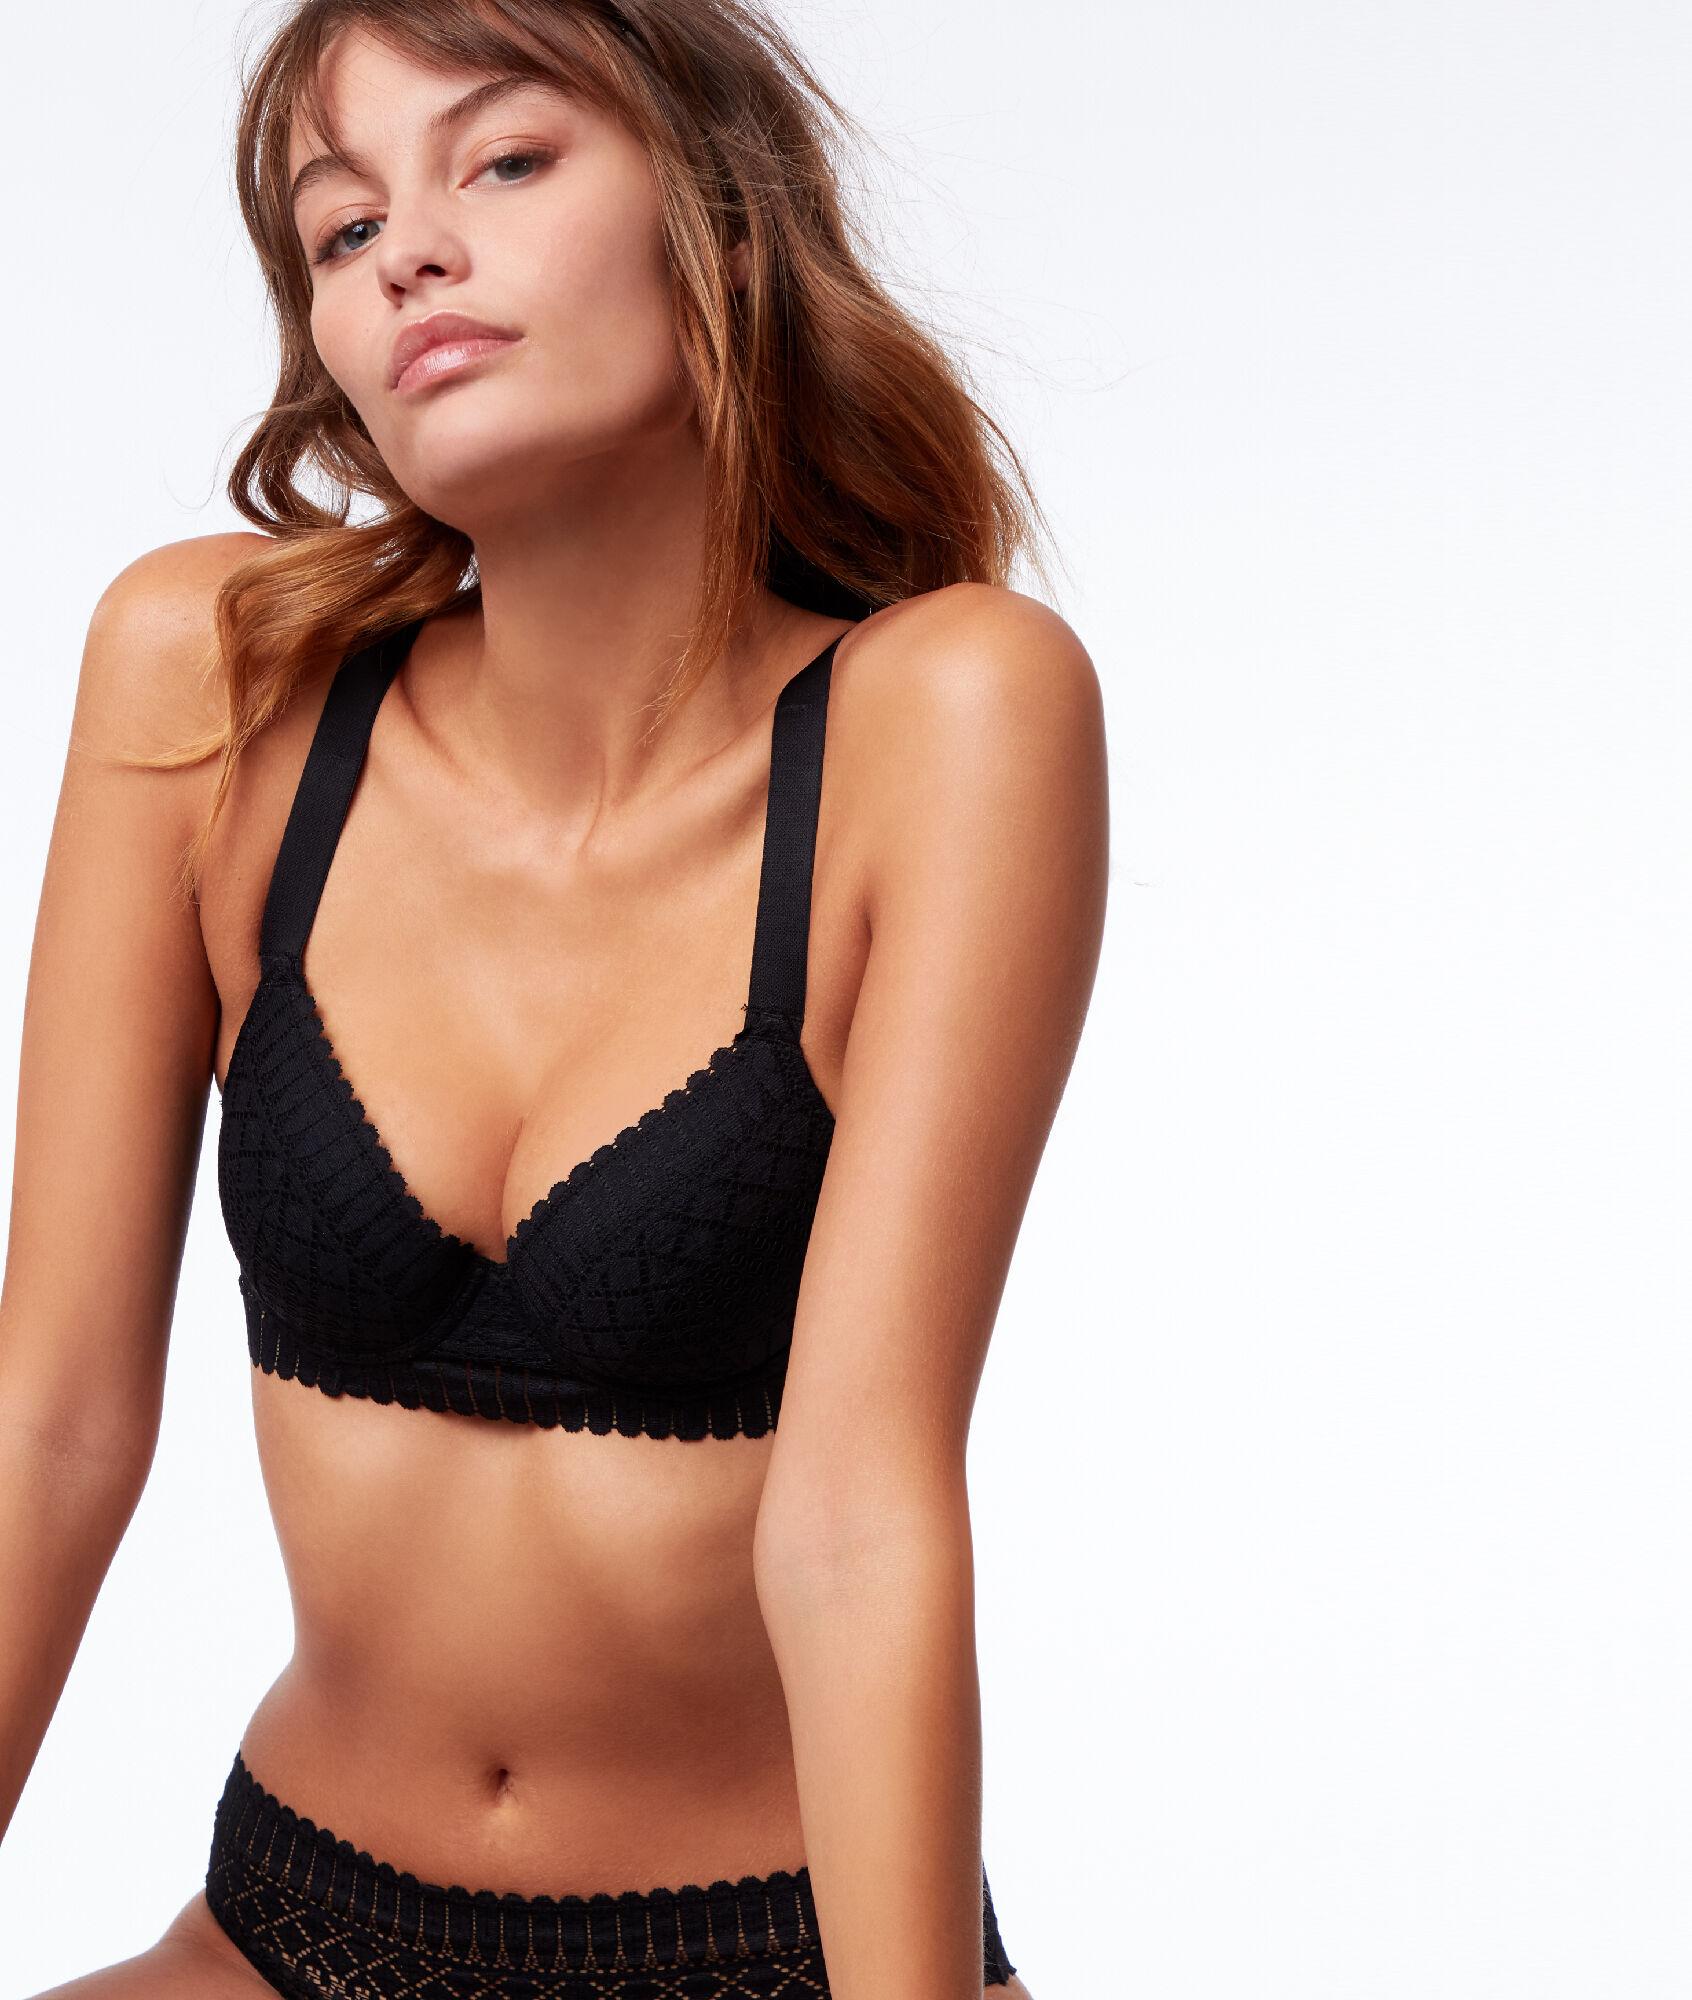 7004076e258 Bra No. 4 - Graphic lace padded bra - Etam